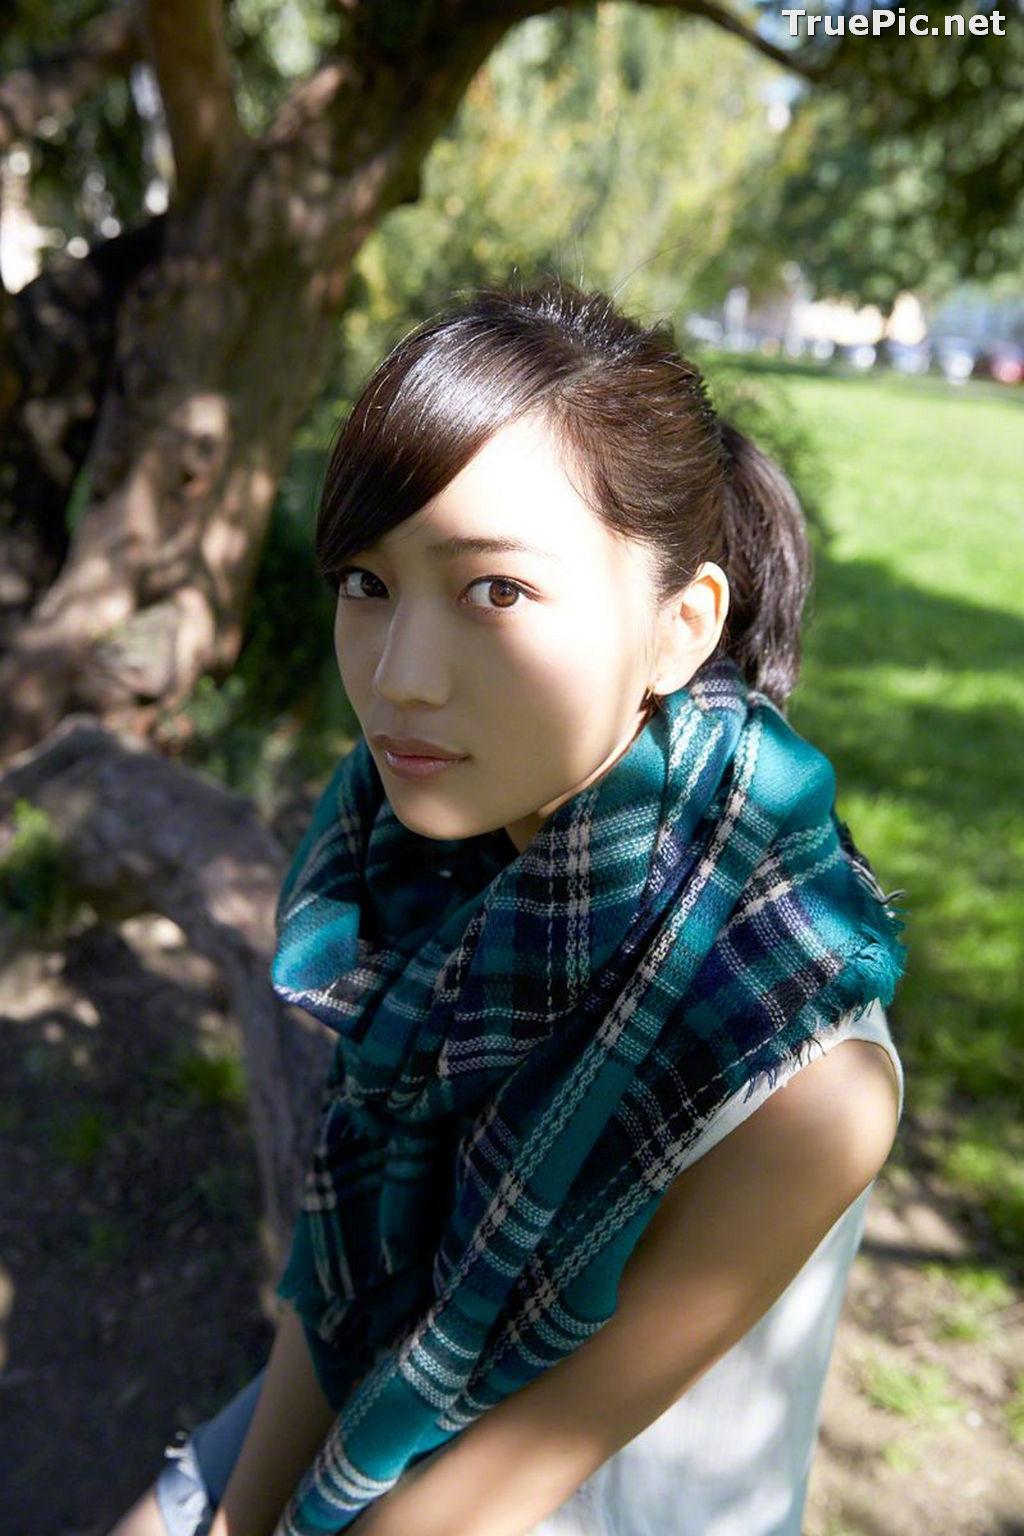 Image Wanibooks No.132 - Japanese Actress and Gravure Idol - Haruna Kawaguchi - TruePic.net - Picture-4